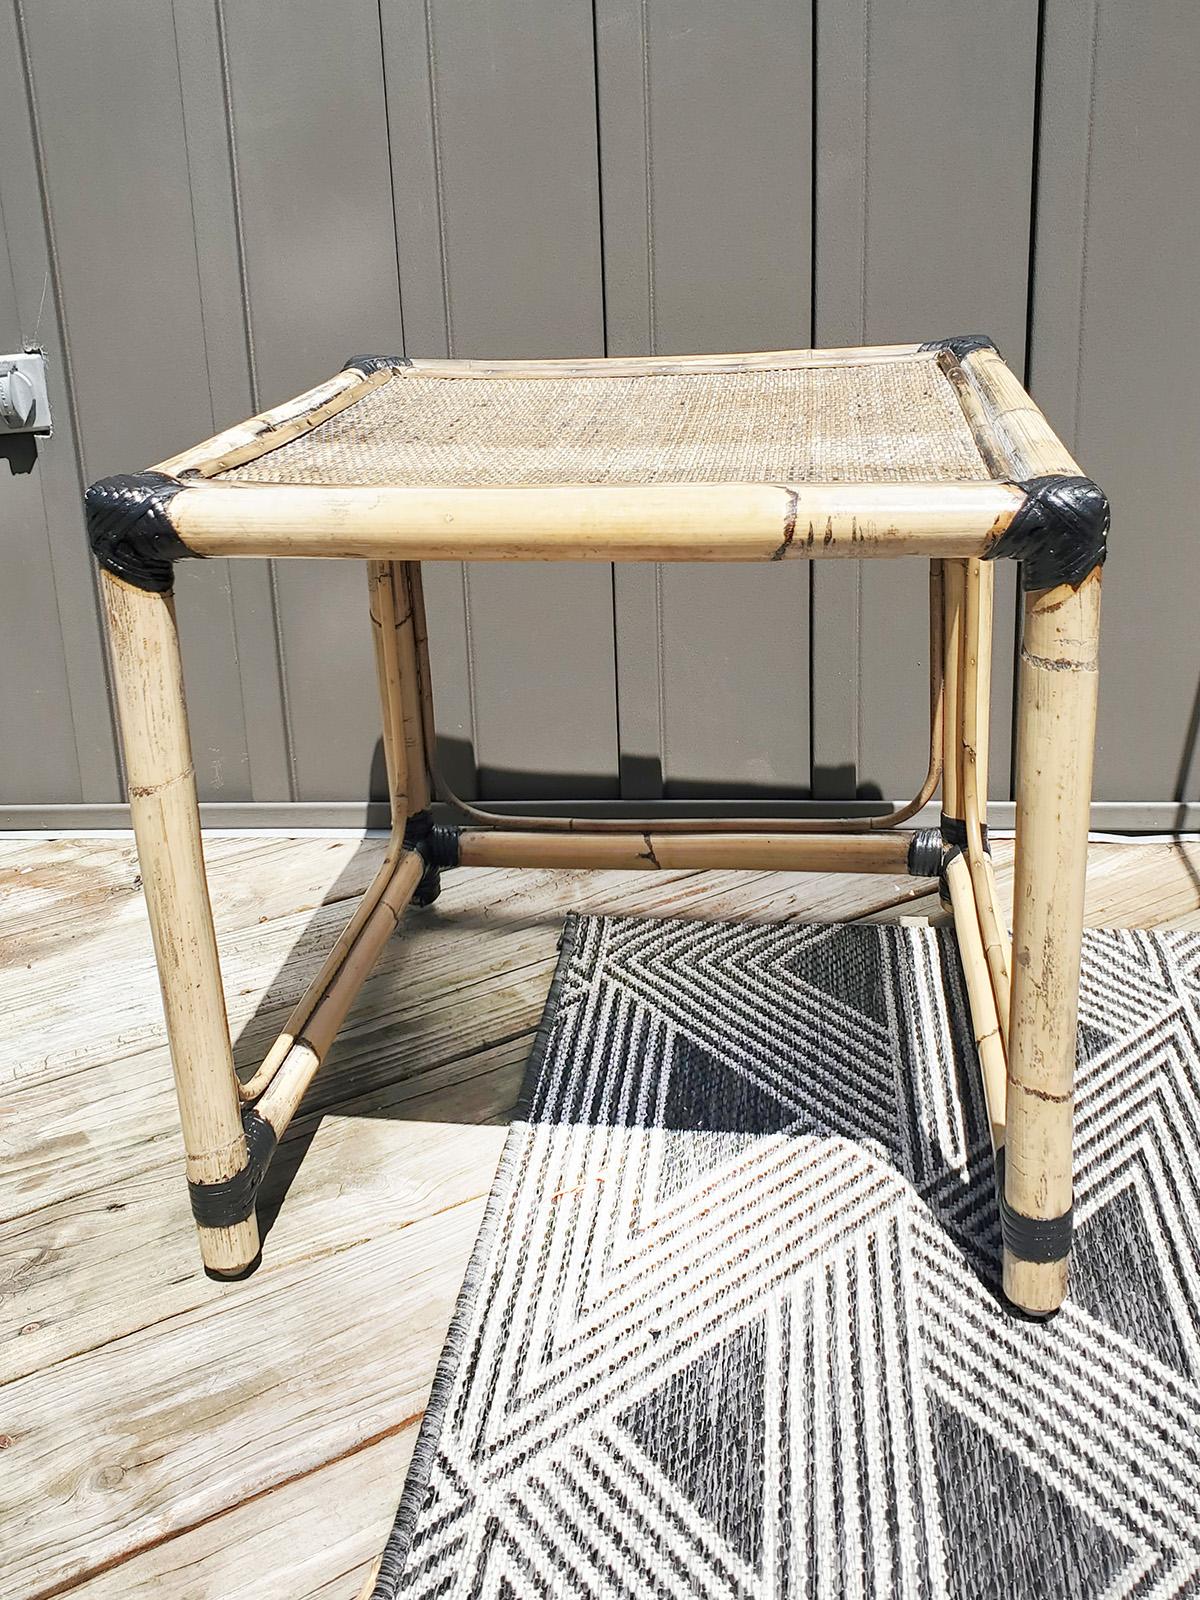 how to restore bamboo furniture and repair rattan